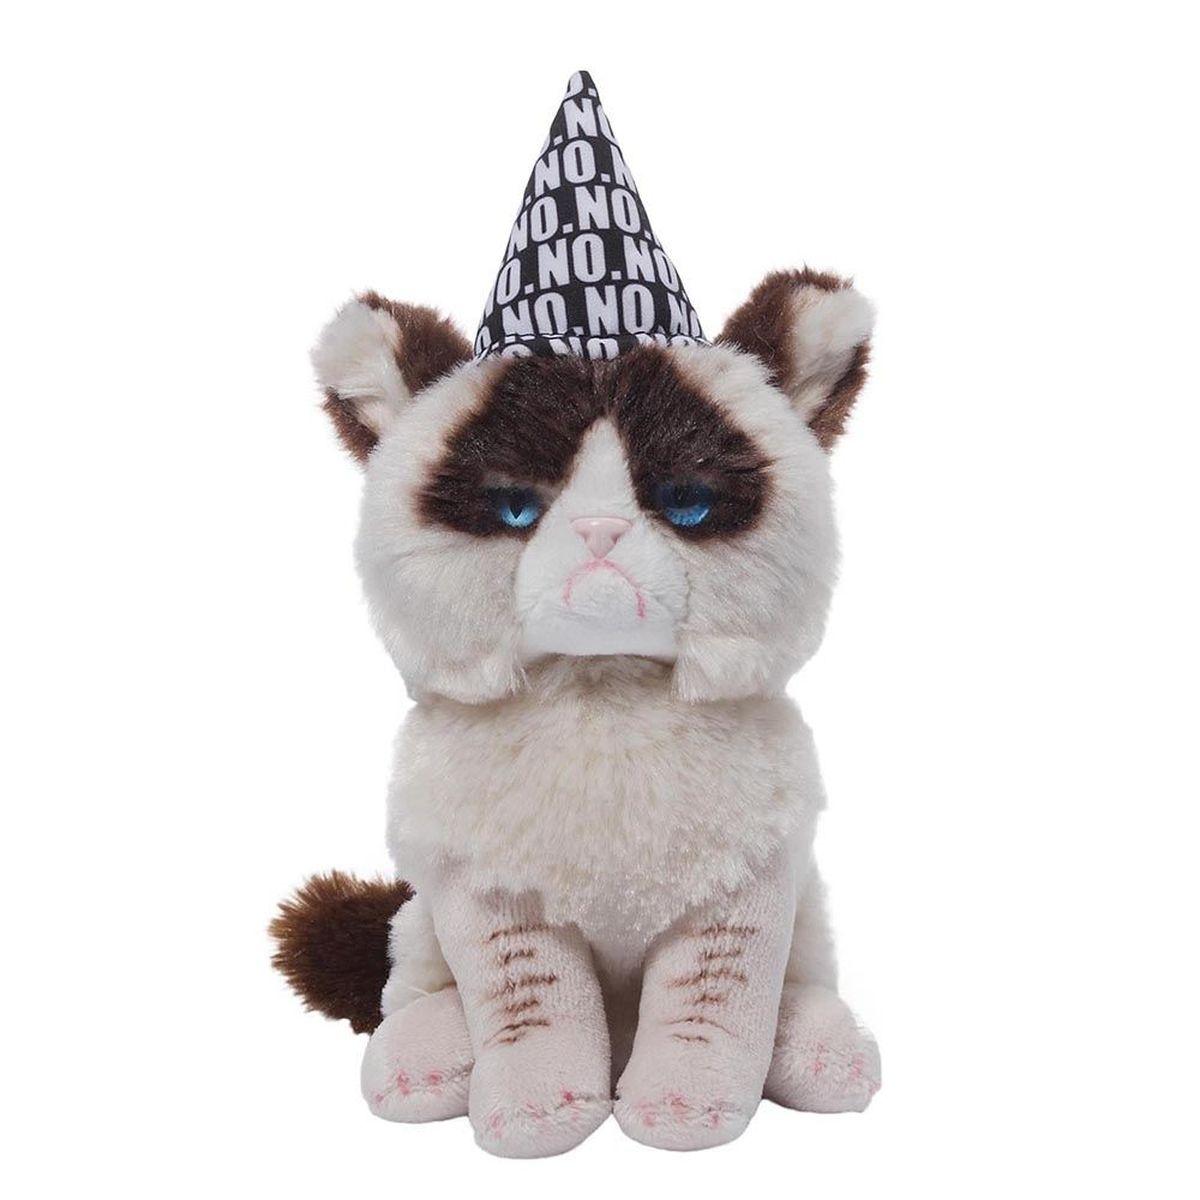 Gund Мягкая игрушка Grumpy Cat Birthday Beanbag 12,5 см bix h2400 advanced full function nursing training manikin with blood pressure measure w194